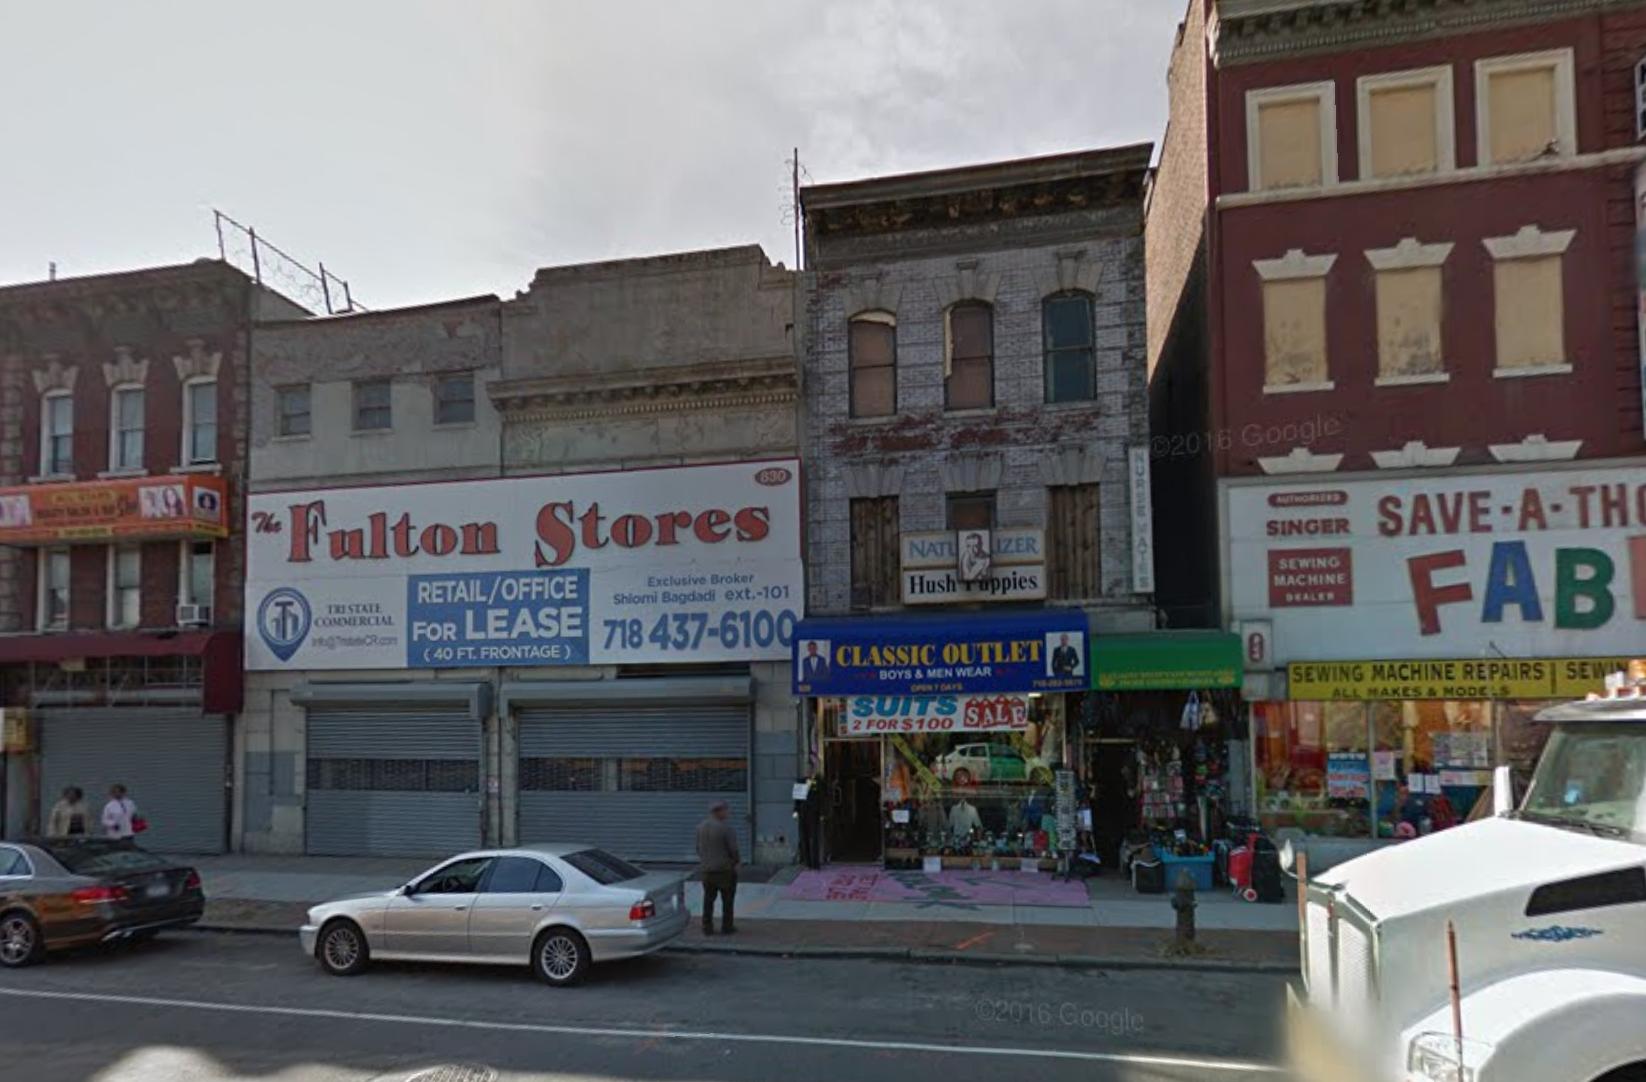 830 Flatbush Avenue in November 2016. image via Google Maps